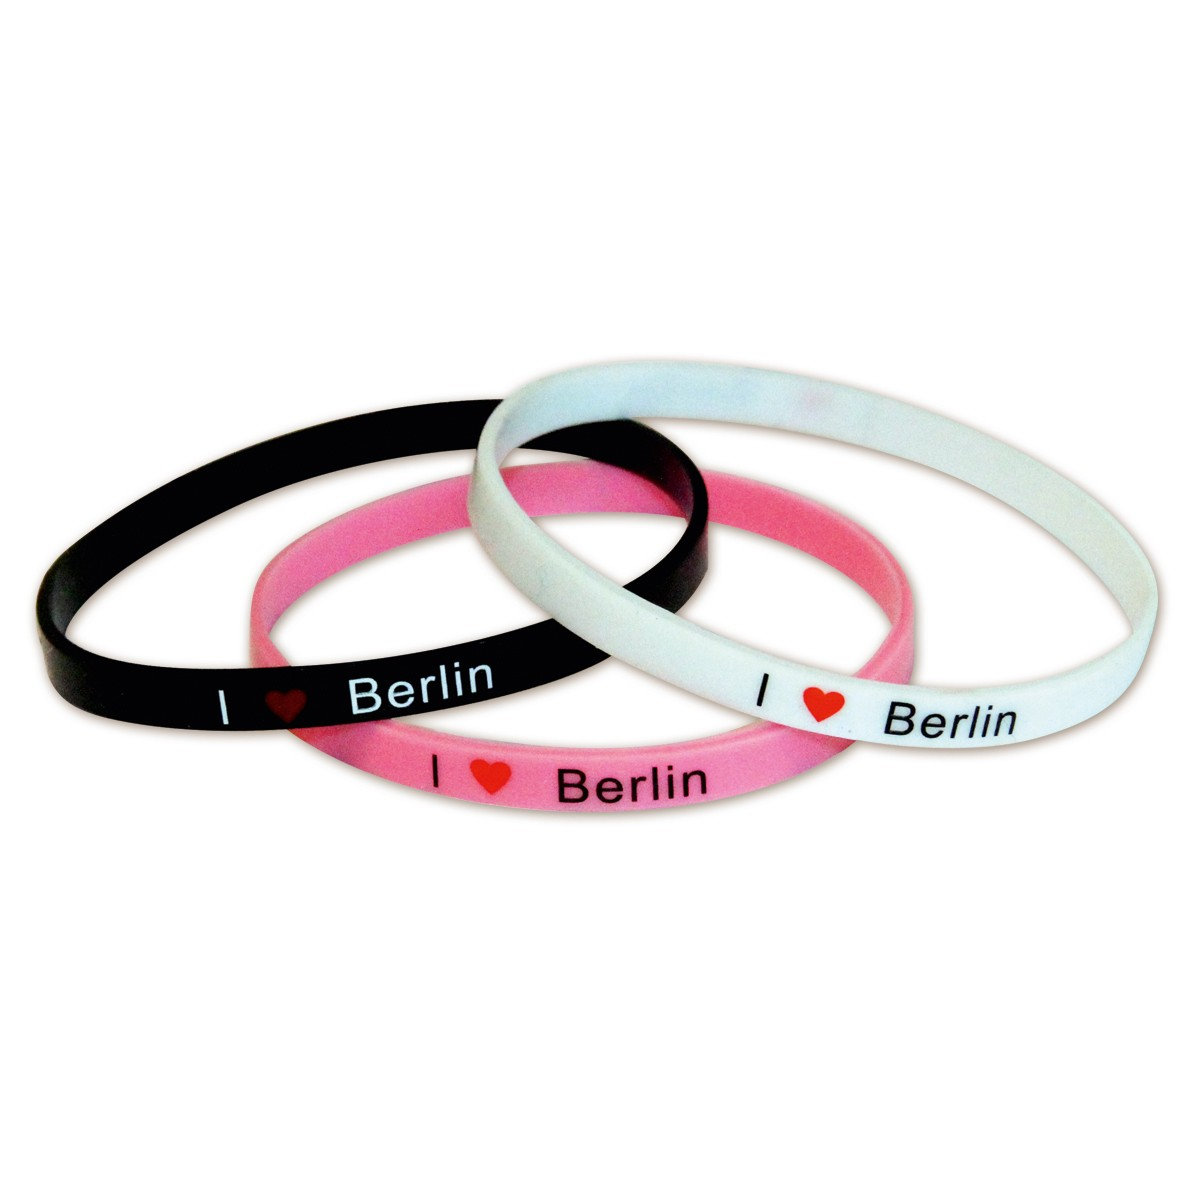 Armband I (Herz) Berlin, 3er Set, schw/rosa/weiß